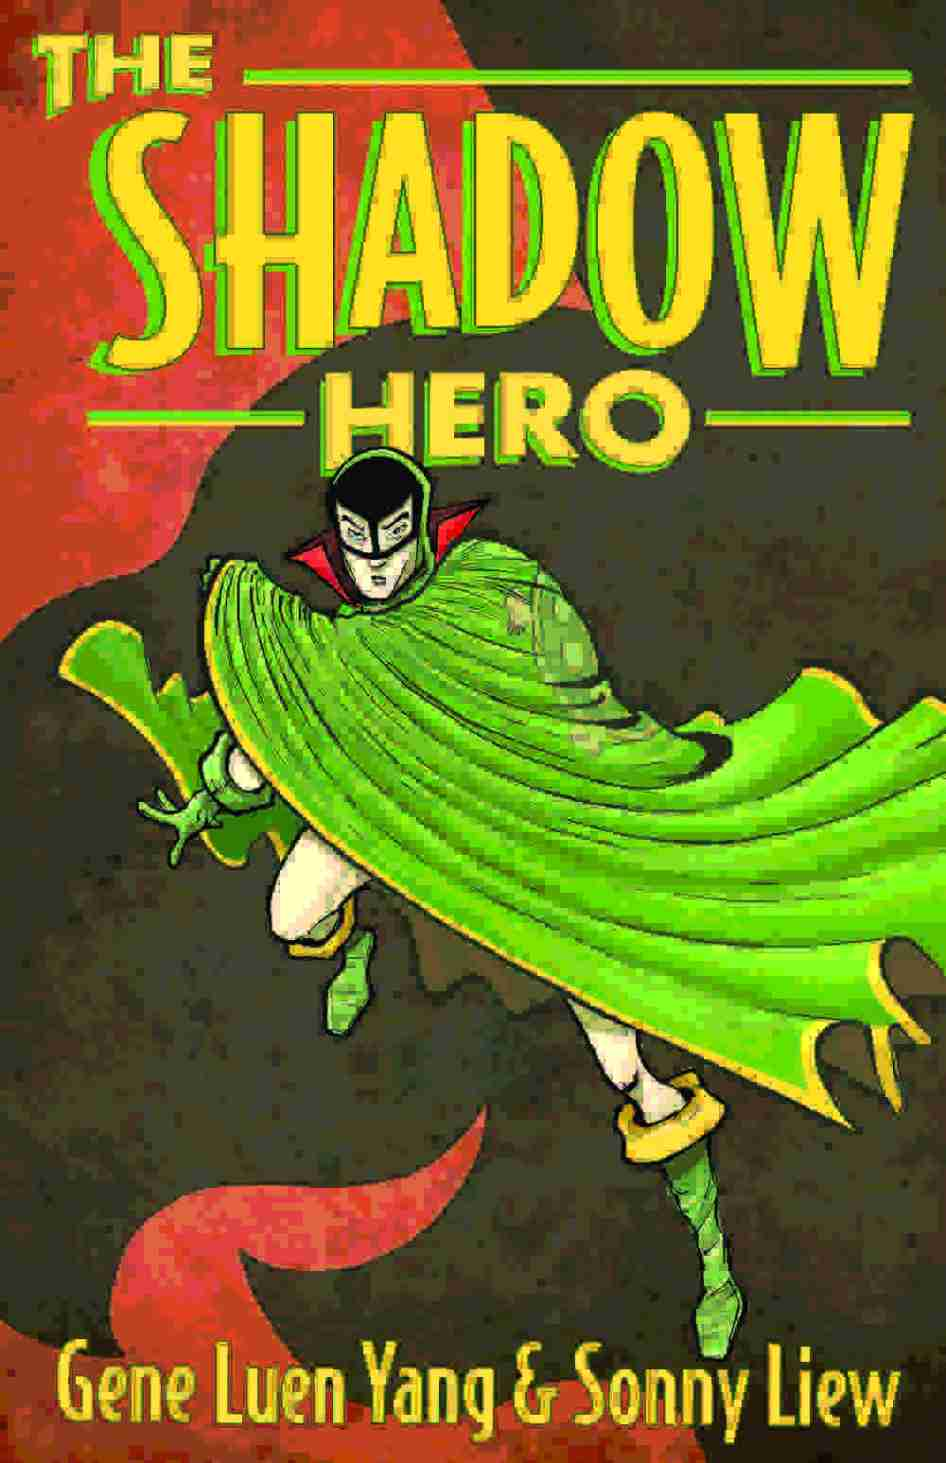 Shadow Hero by Gene Luen Yang and Sonny Liew